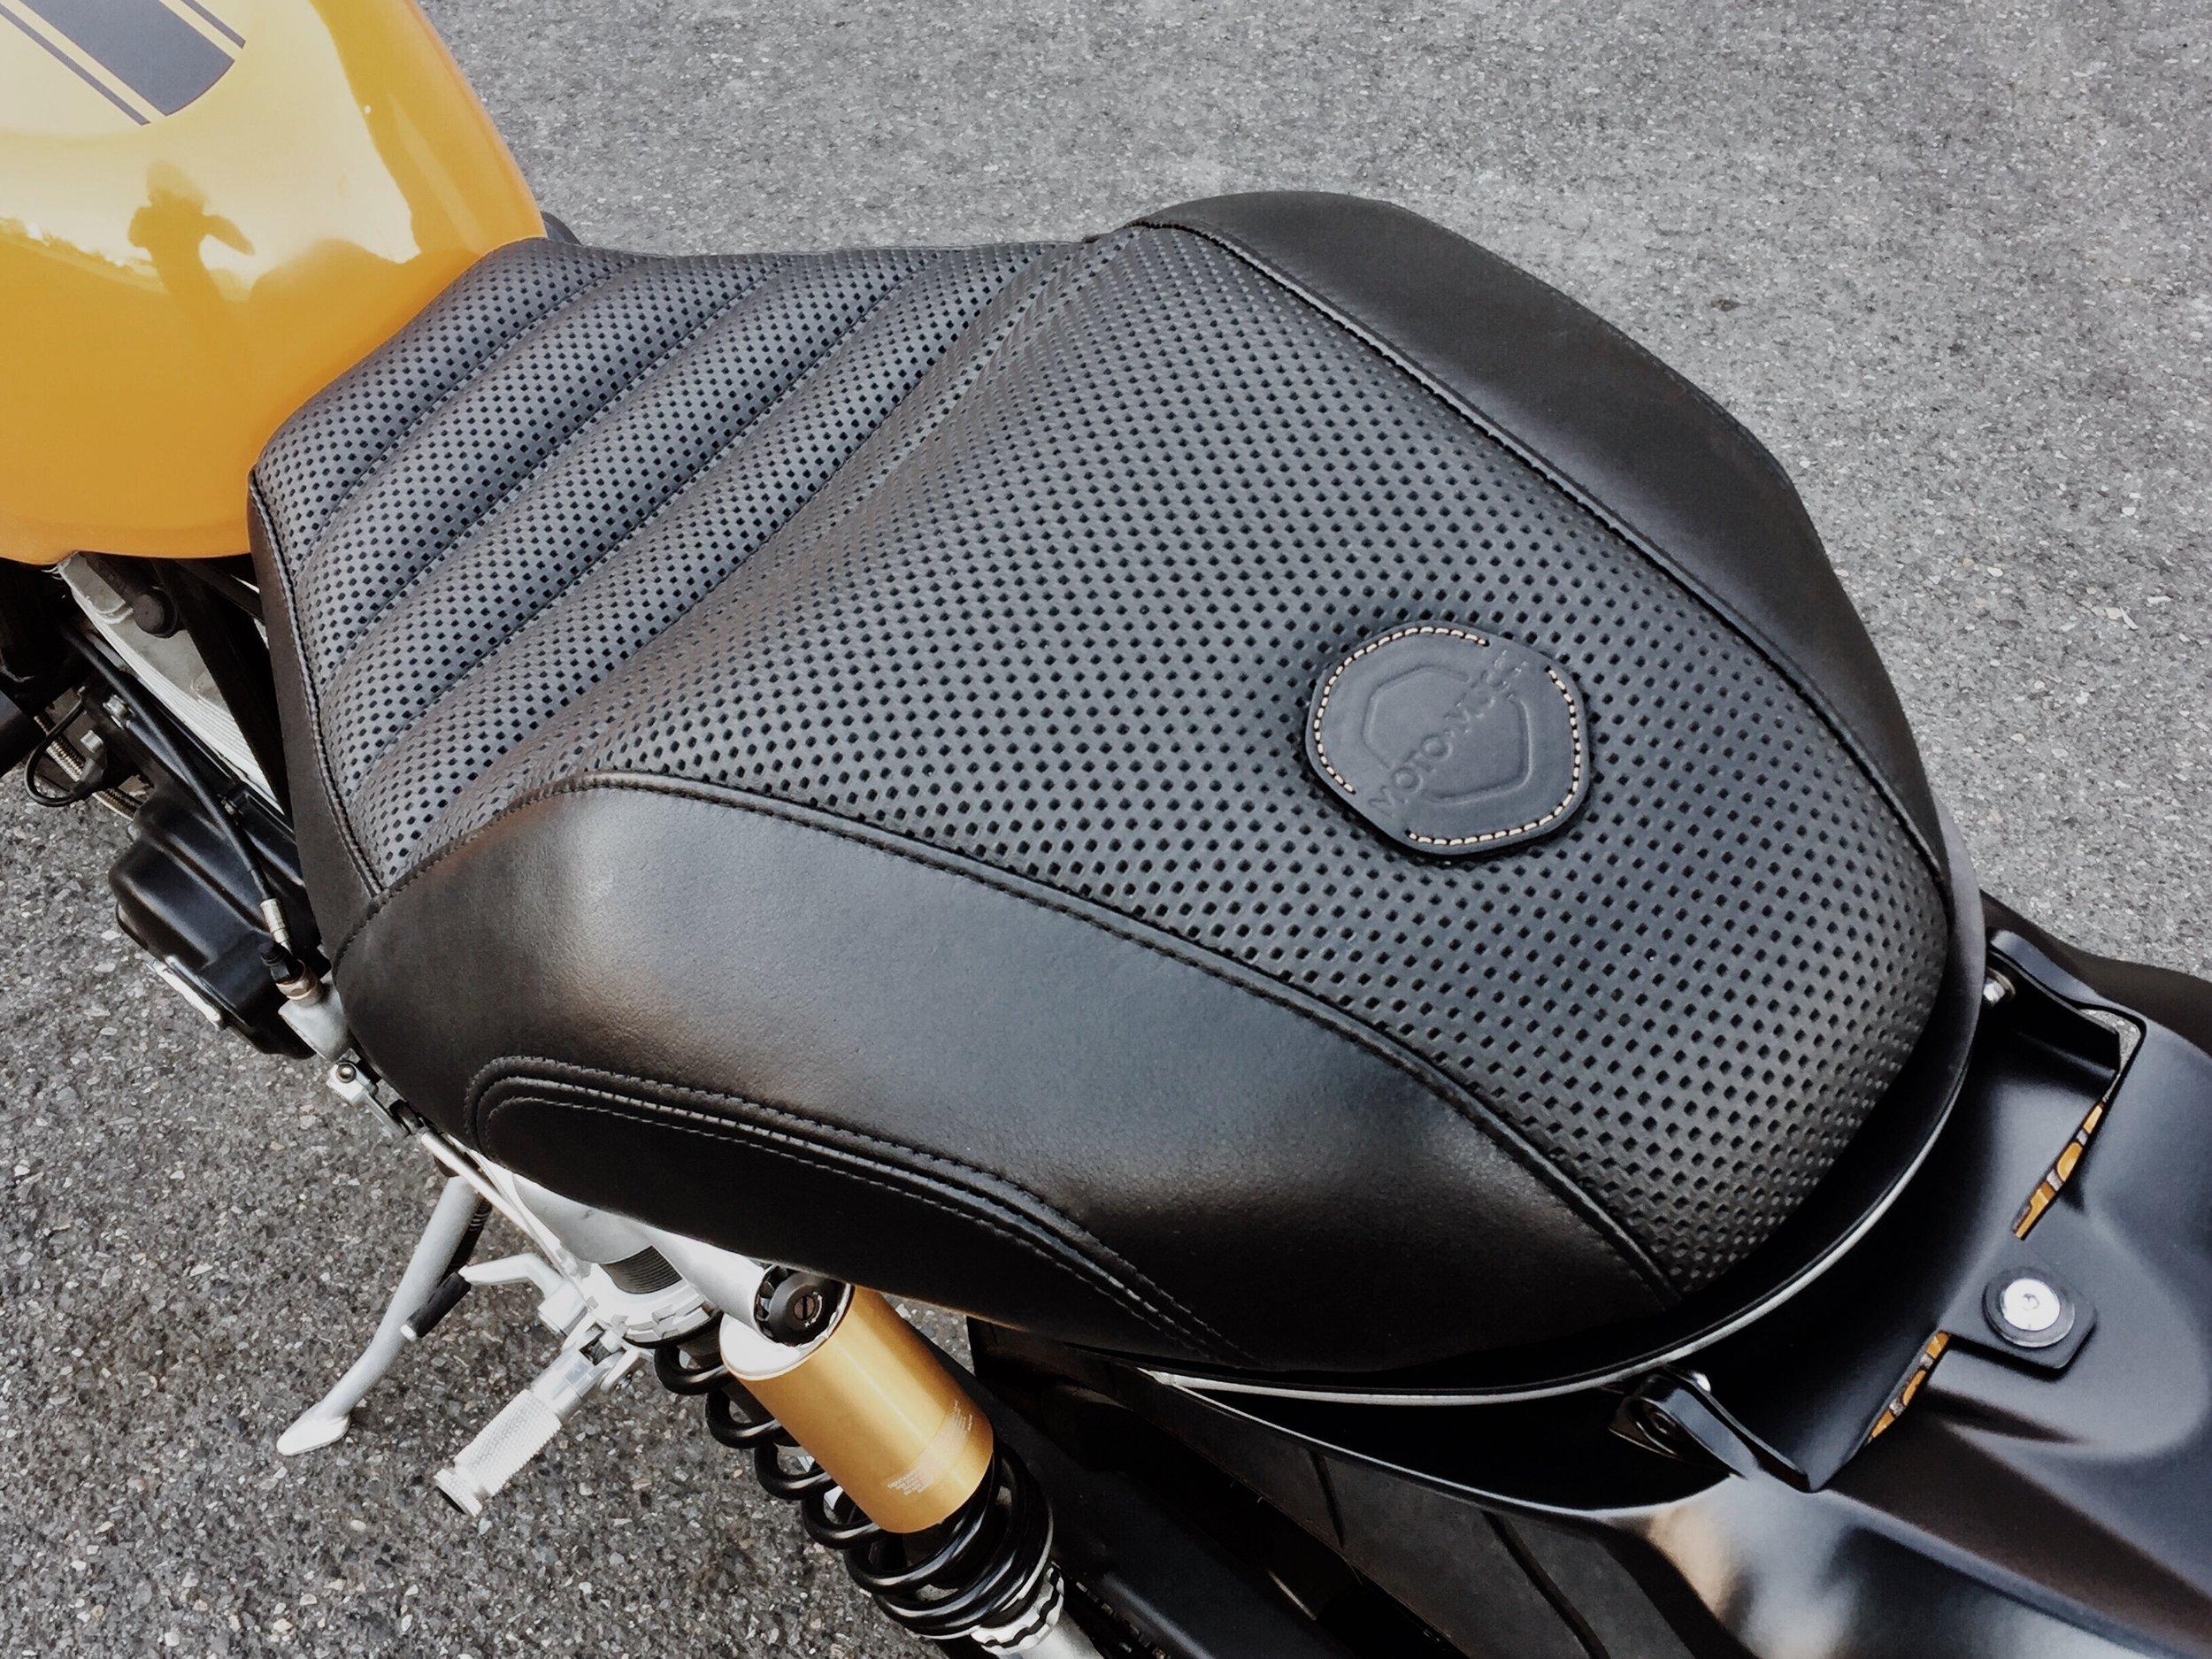 Moto-Mucci_Custom_Ducati_SC1000_Seat (12).jpg